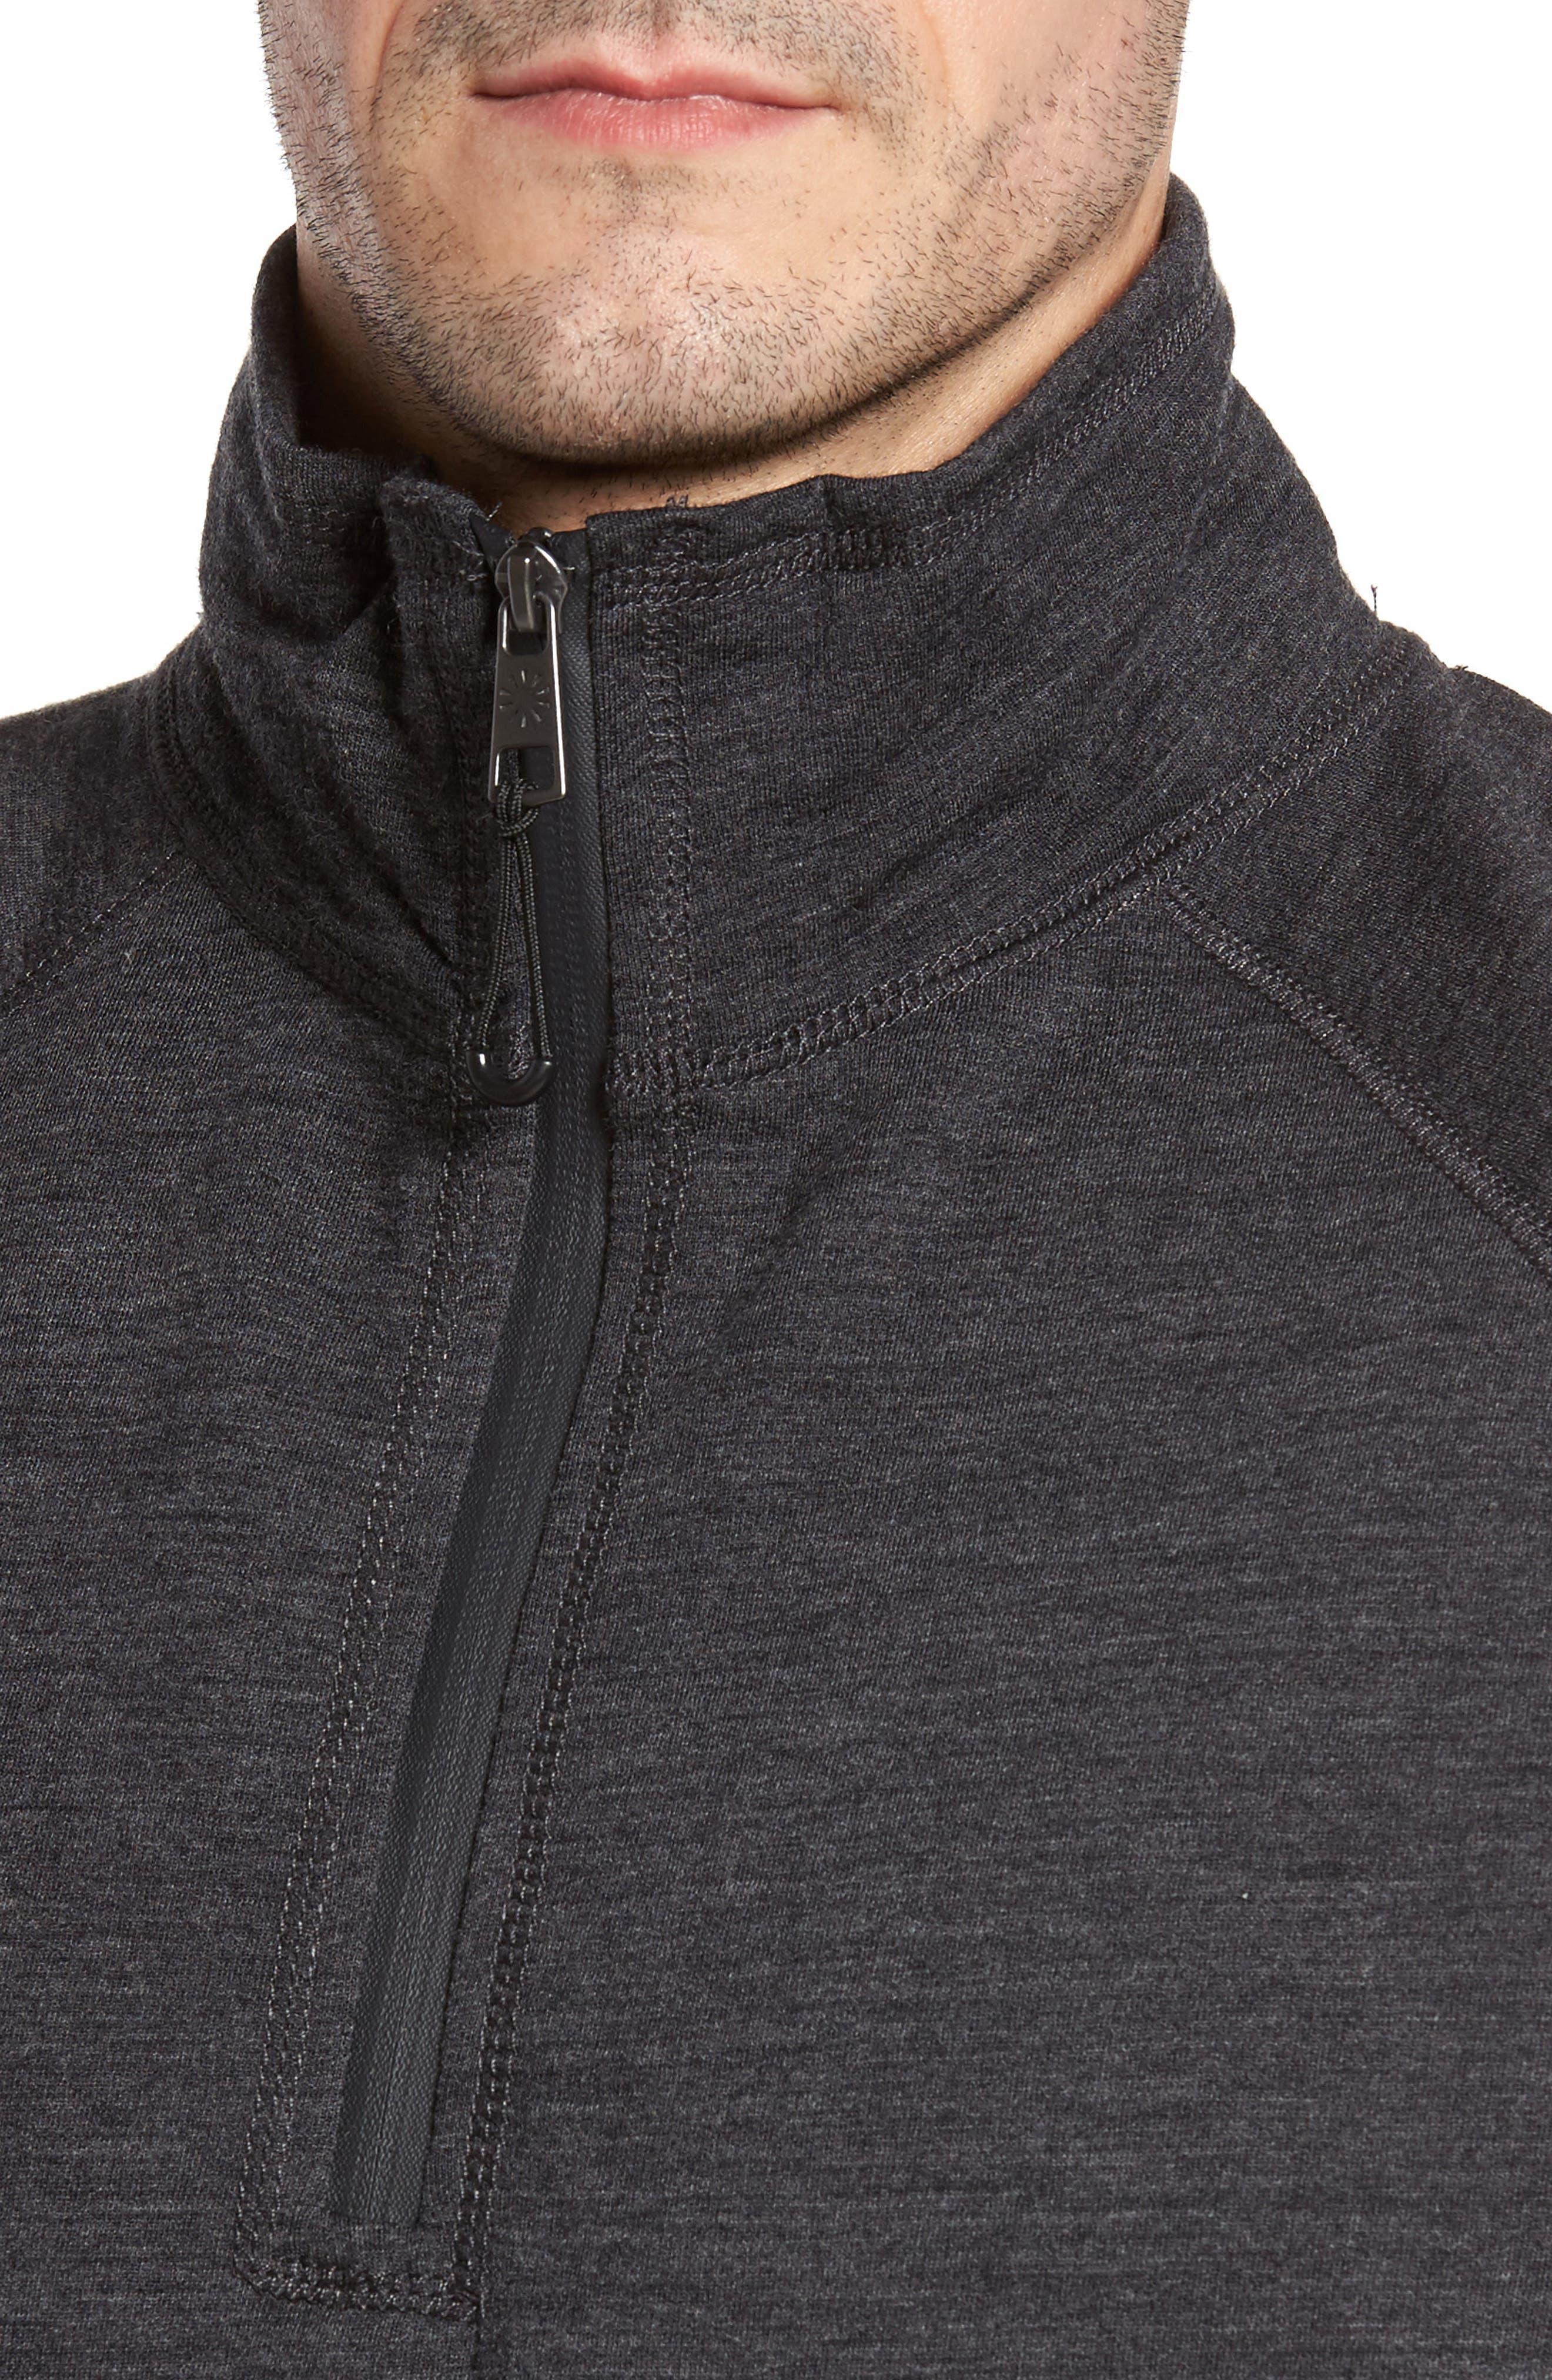 Merino Wool Quarter Zip Pullover,                             Alternate thumbnail 4, color,                             010